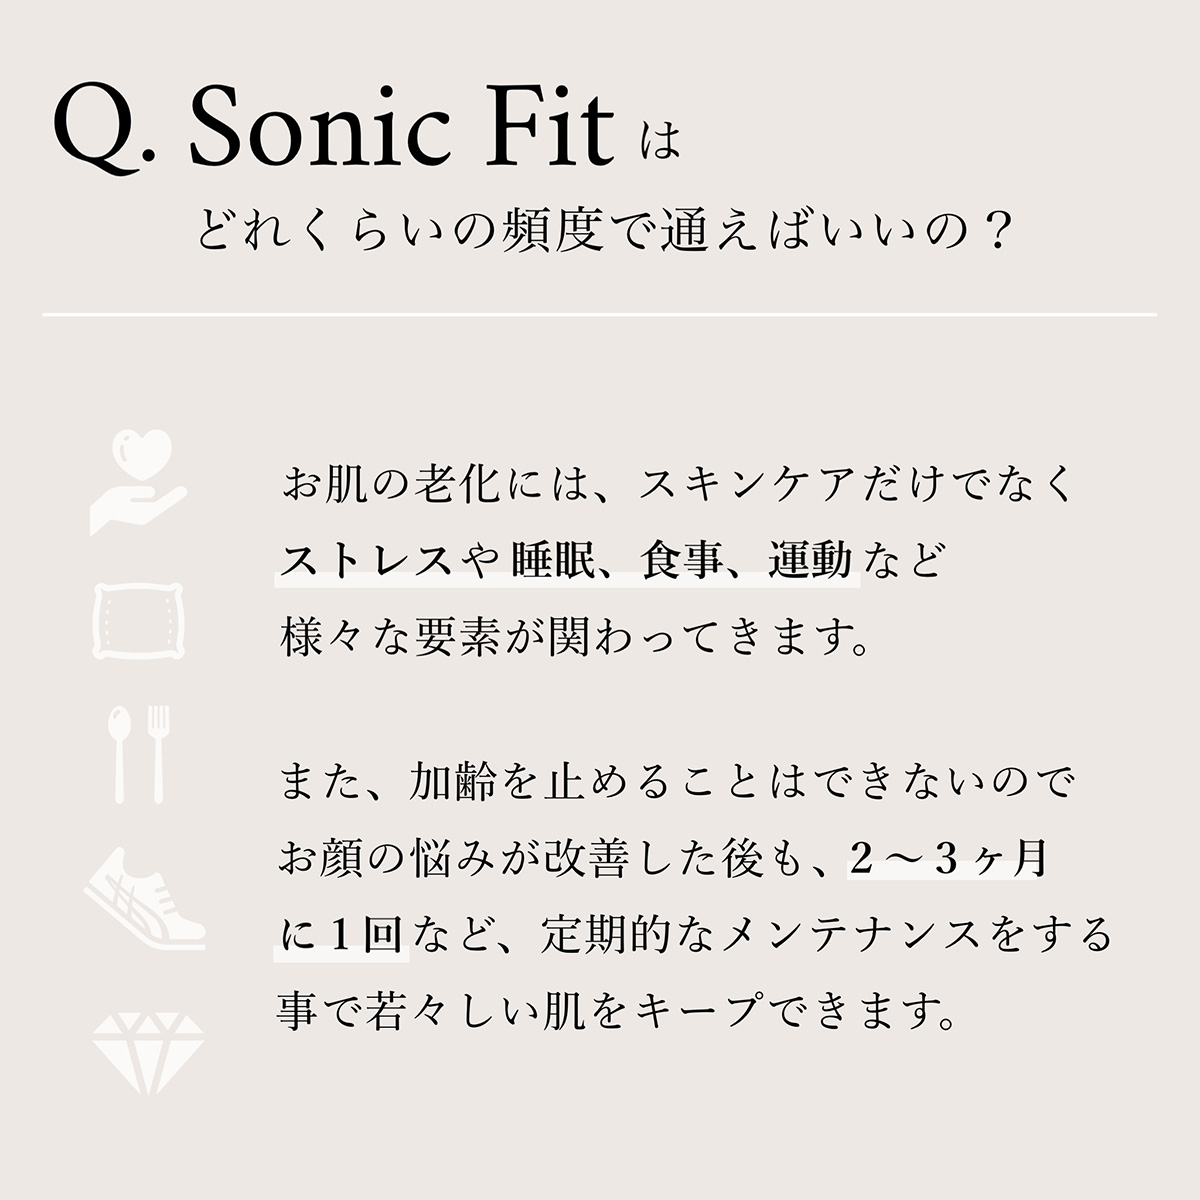 Sonic Fit 頻度